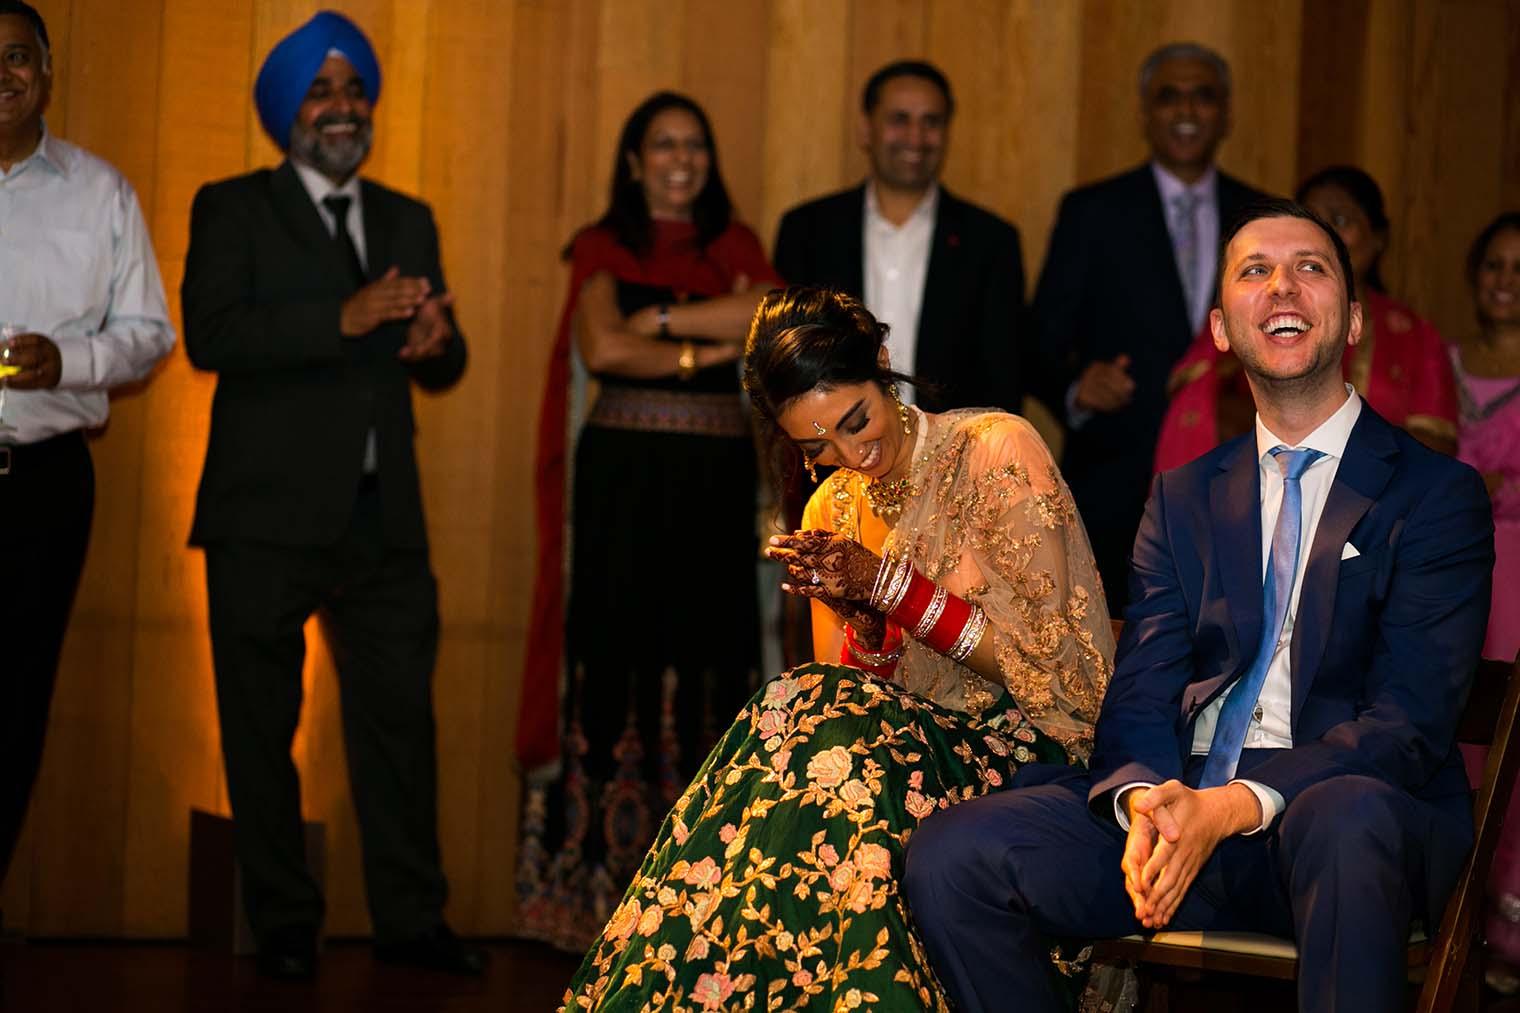 curiodyssey wedding reception speeches